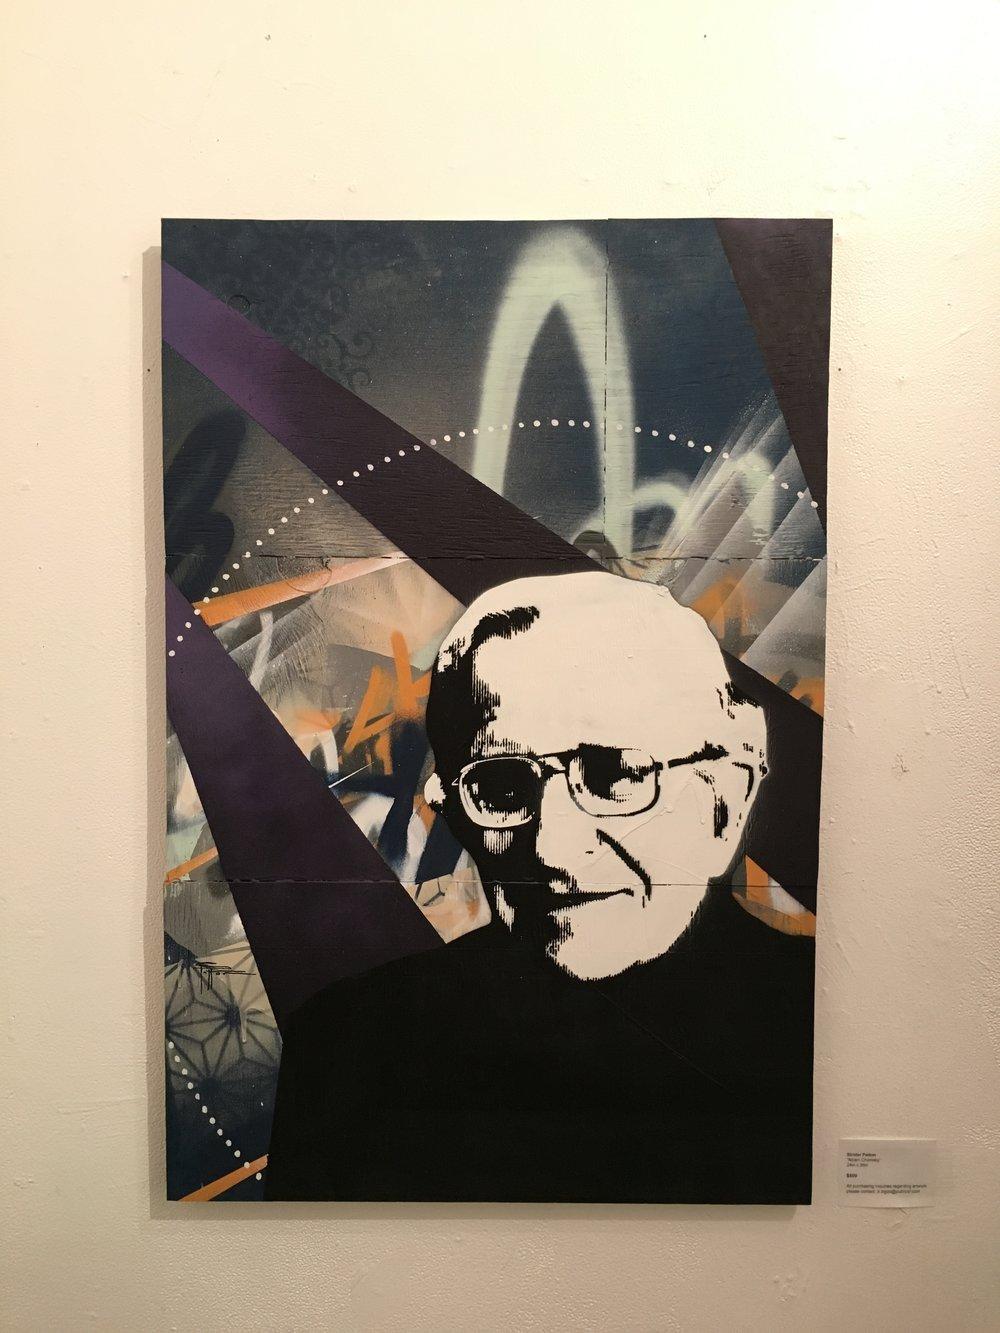 Noam Chomsky - Idols show - San Francisco, CA 2016